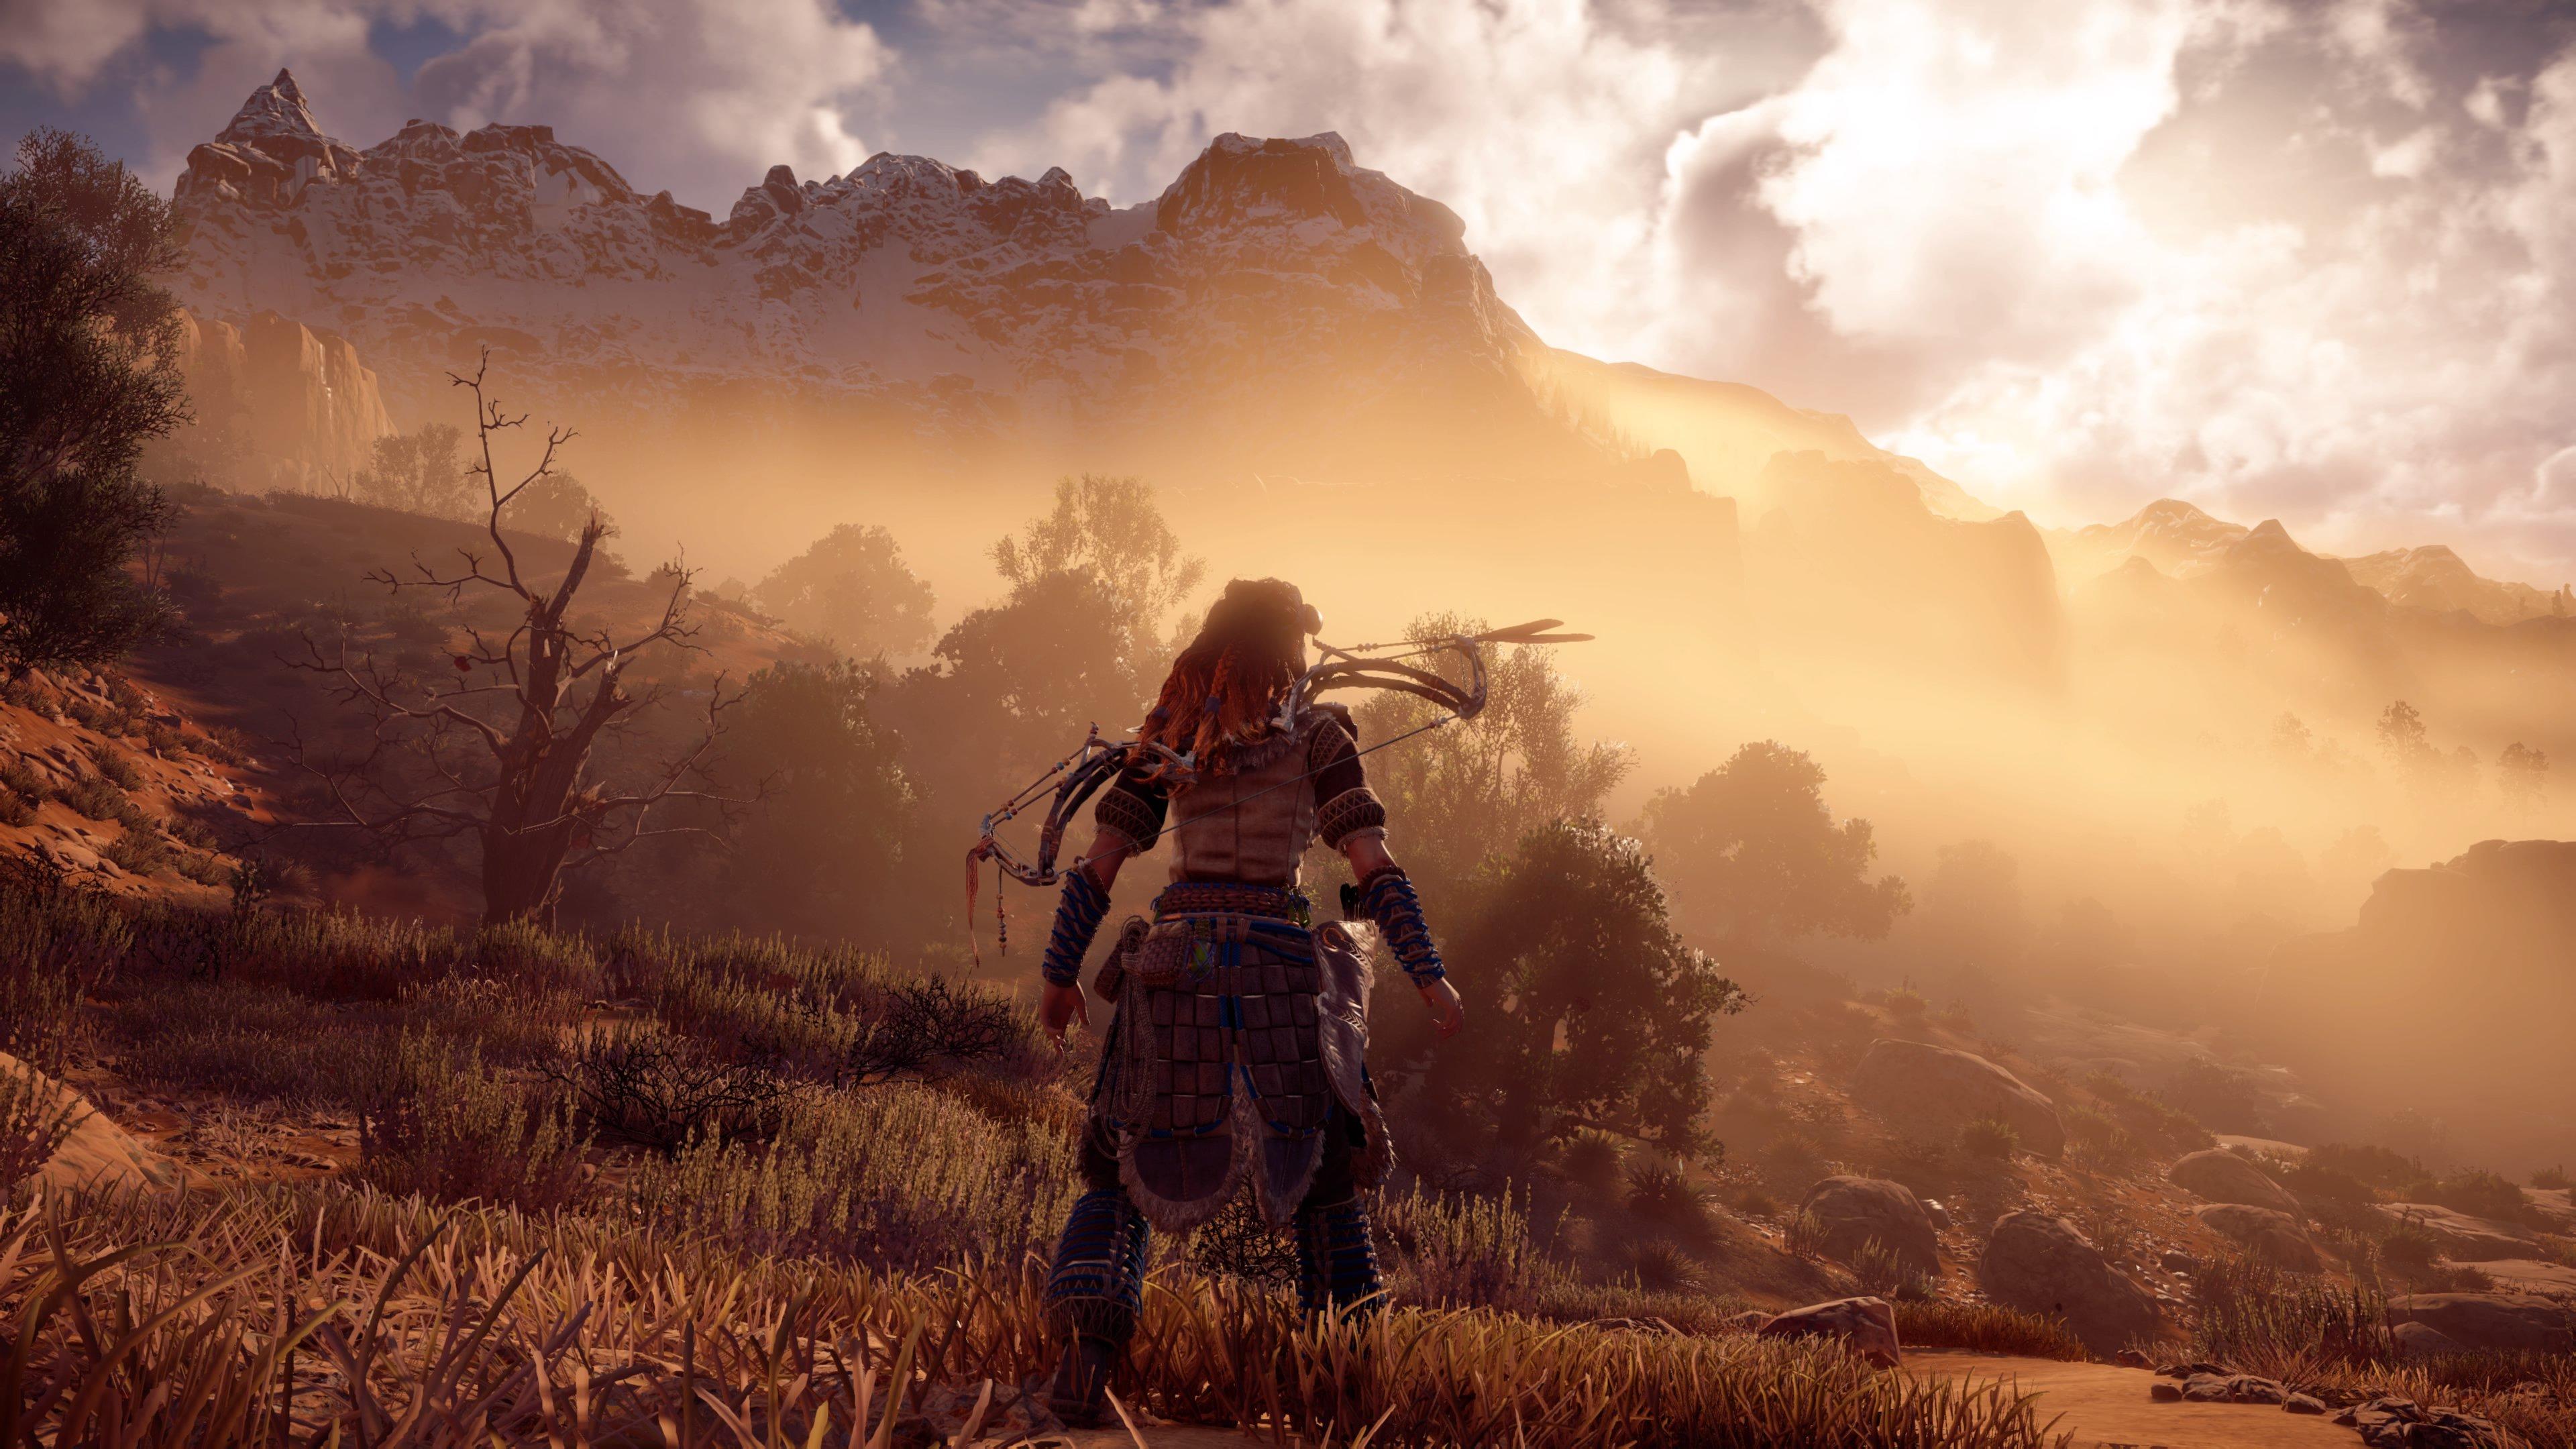 Horizon Zero Dawn 2017 4k, HD Games, 4k Wallpapers, Images ...